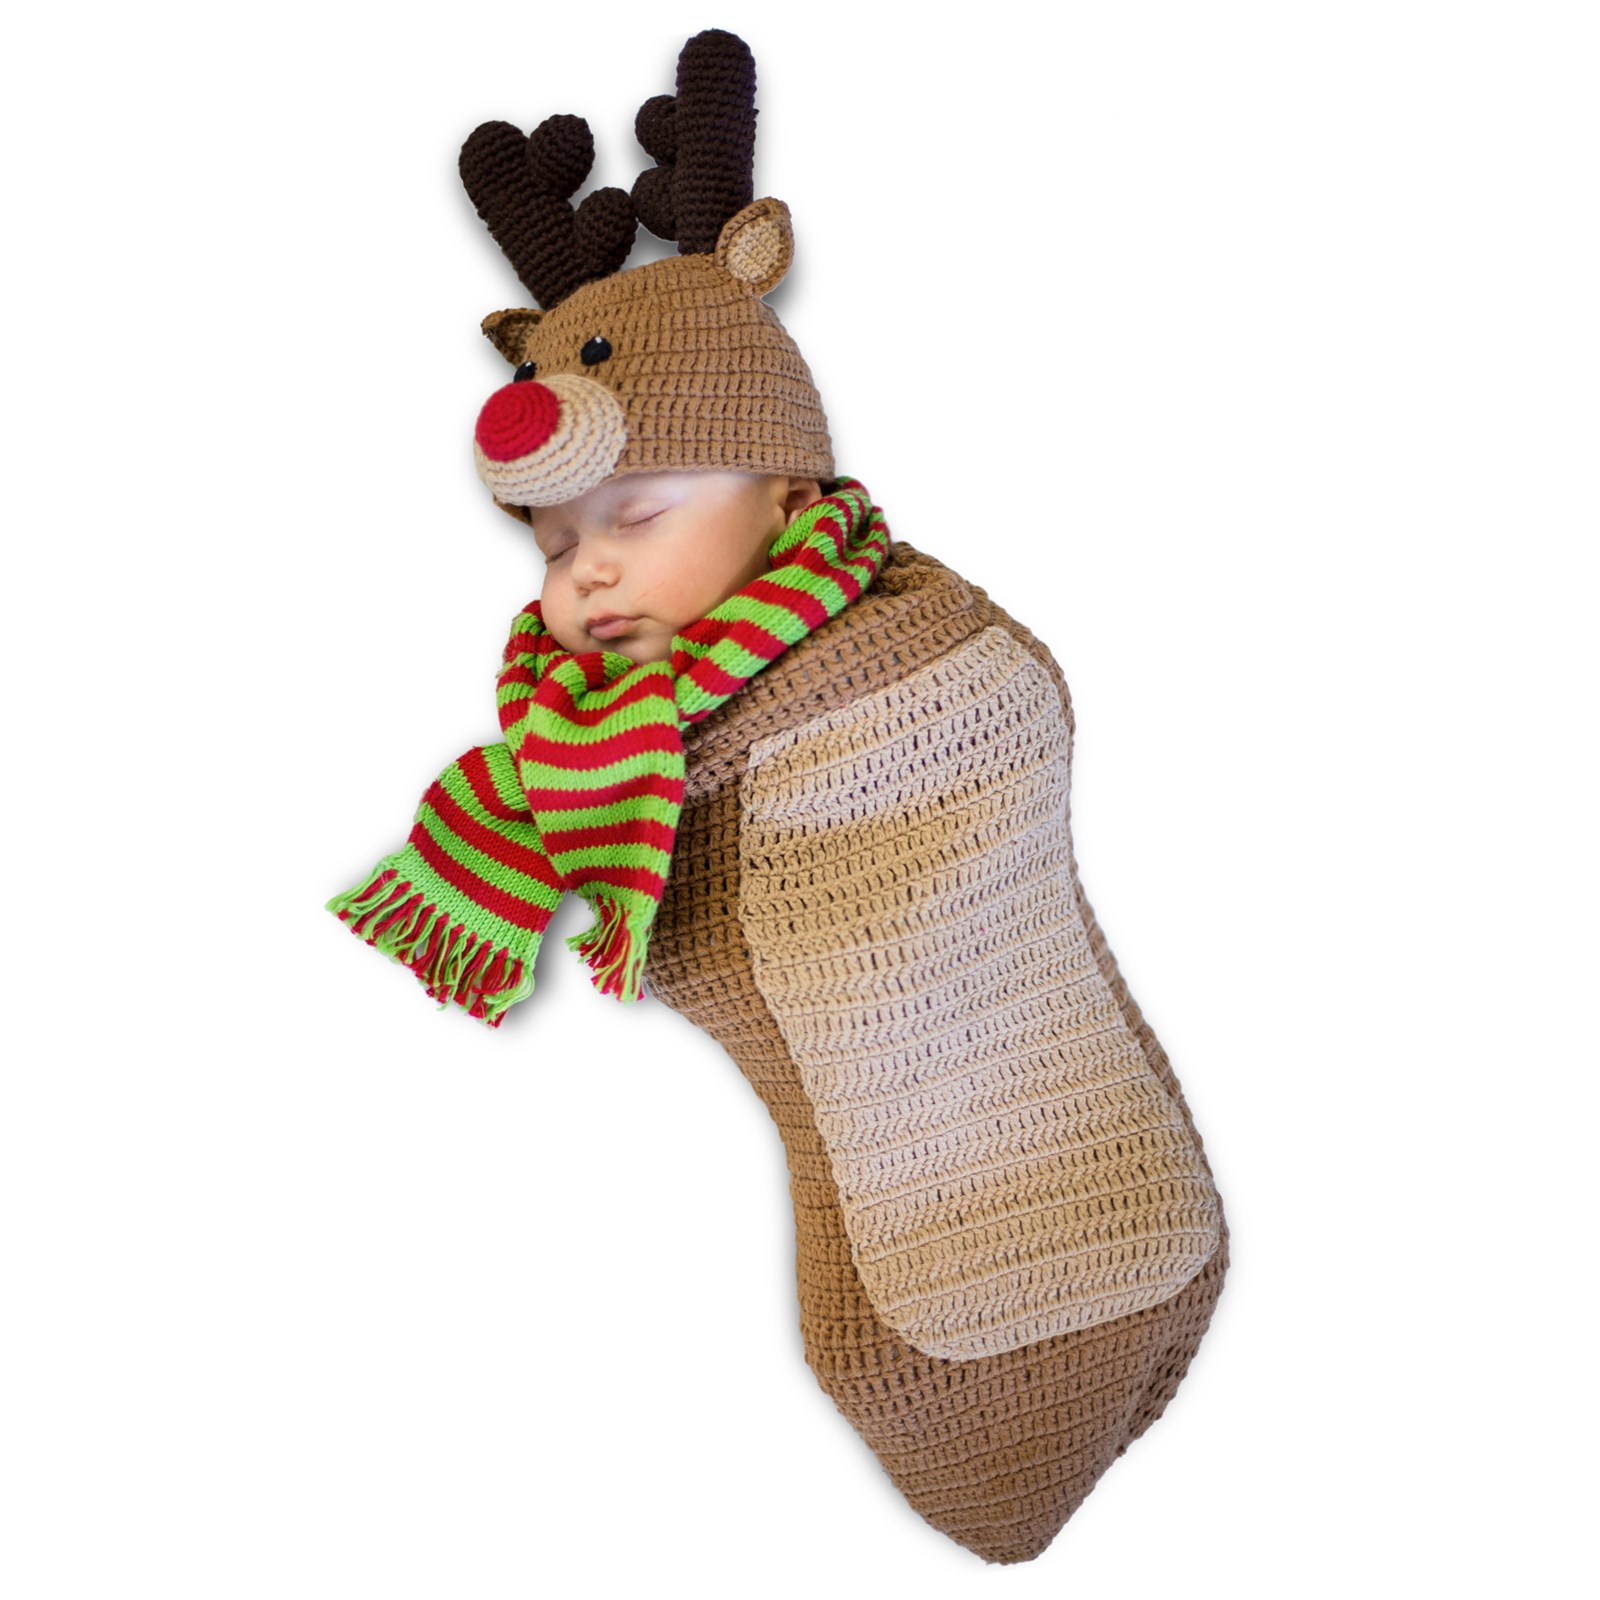 Randolph The Reindeer Halloween Costume